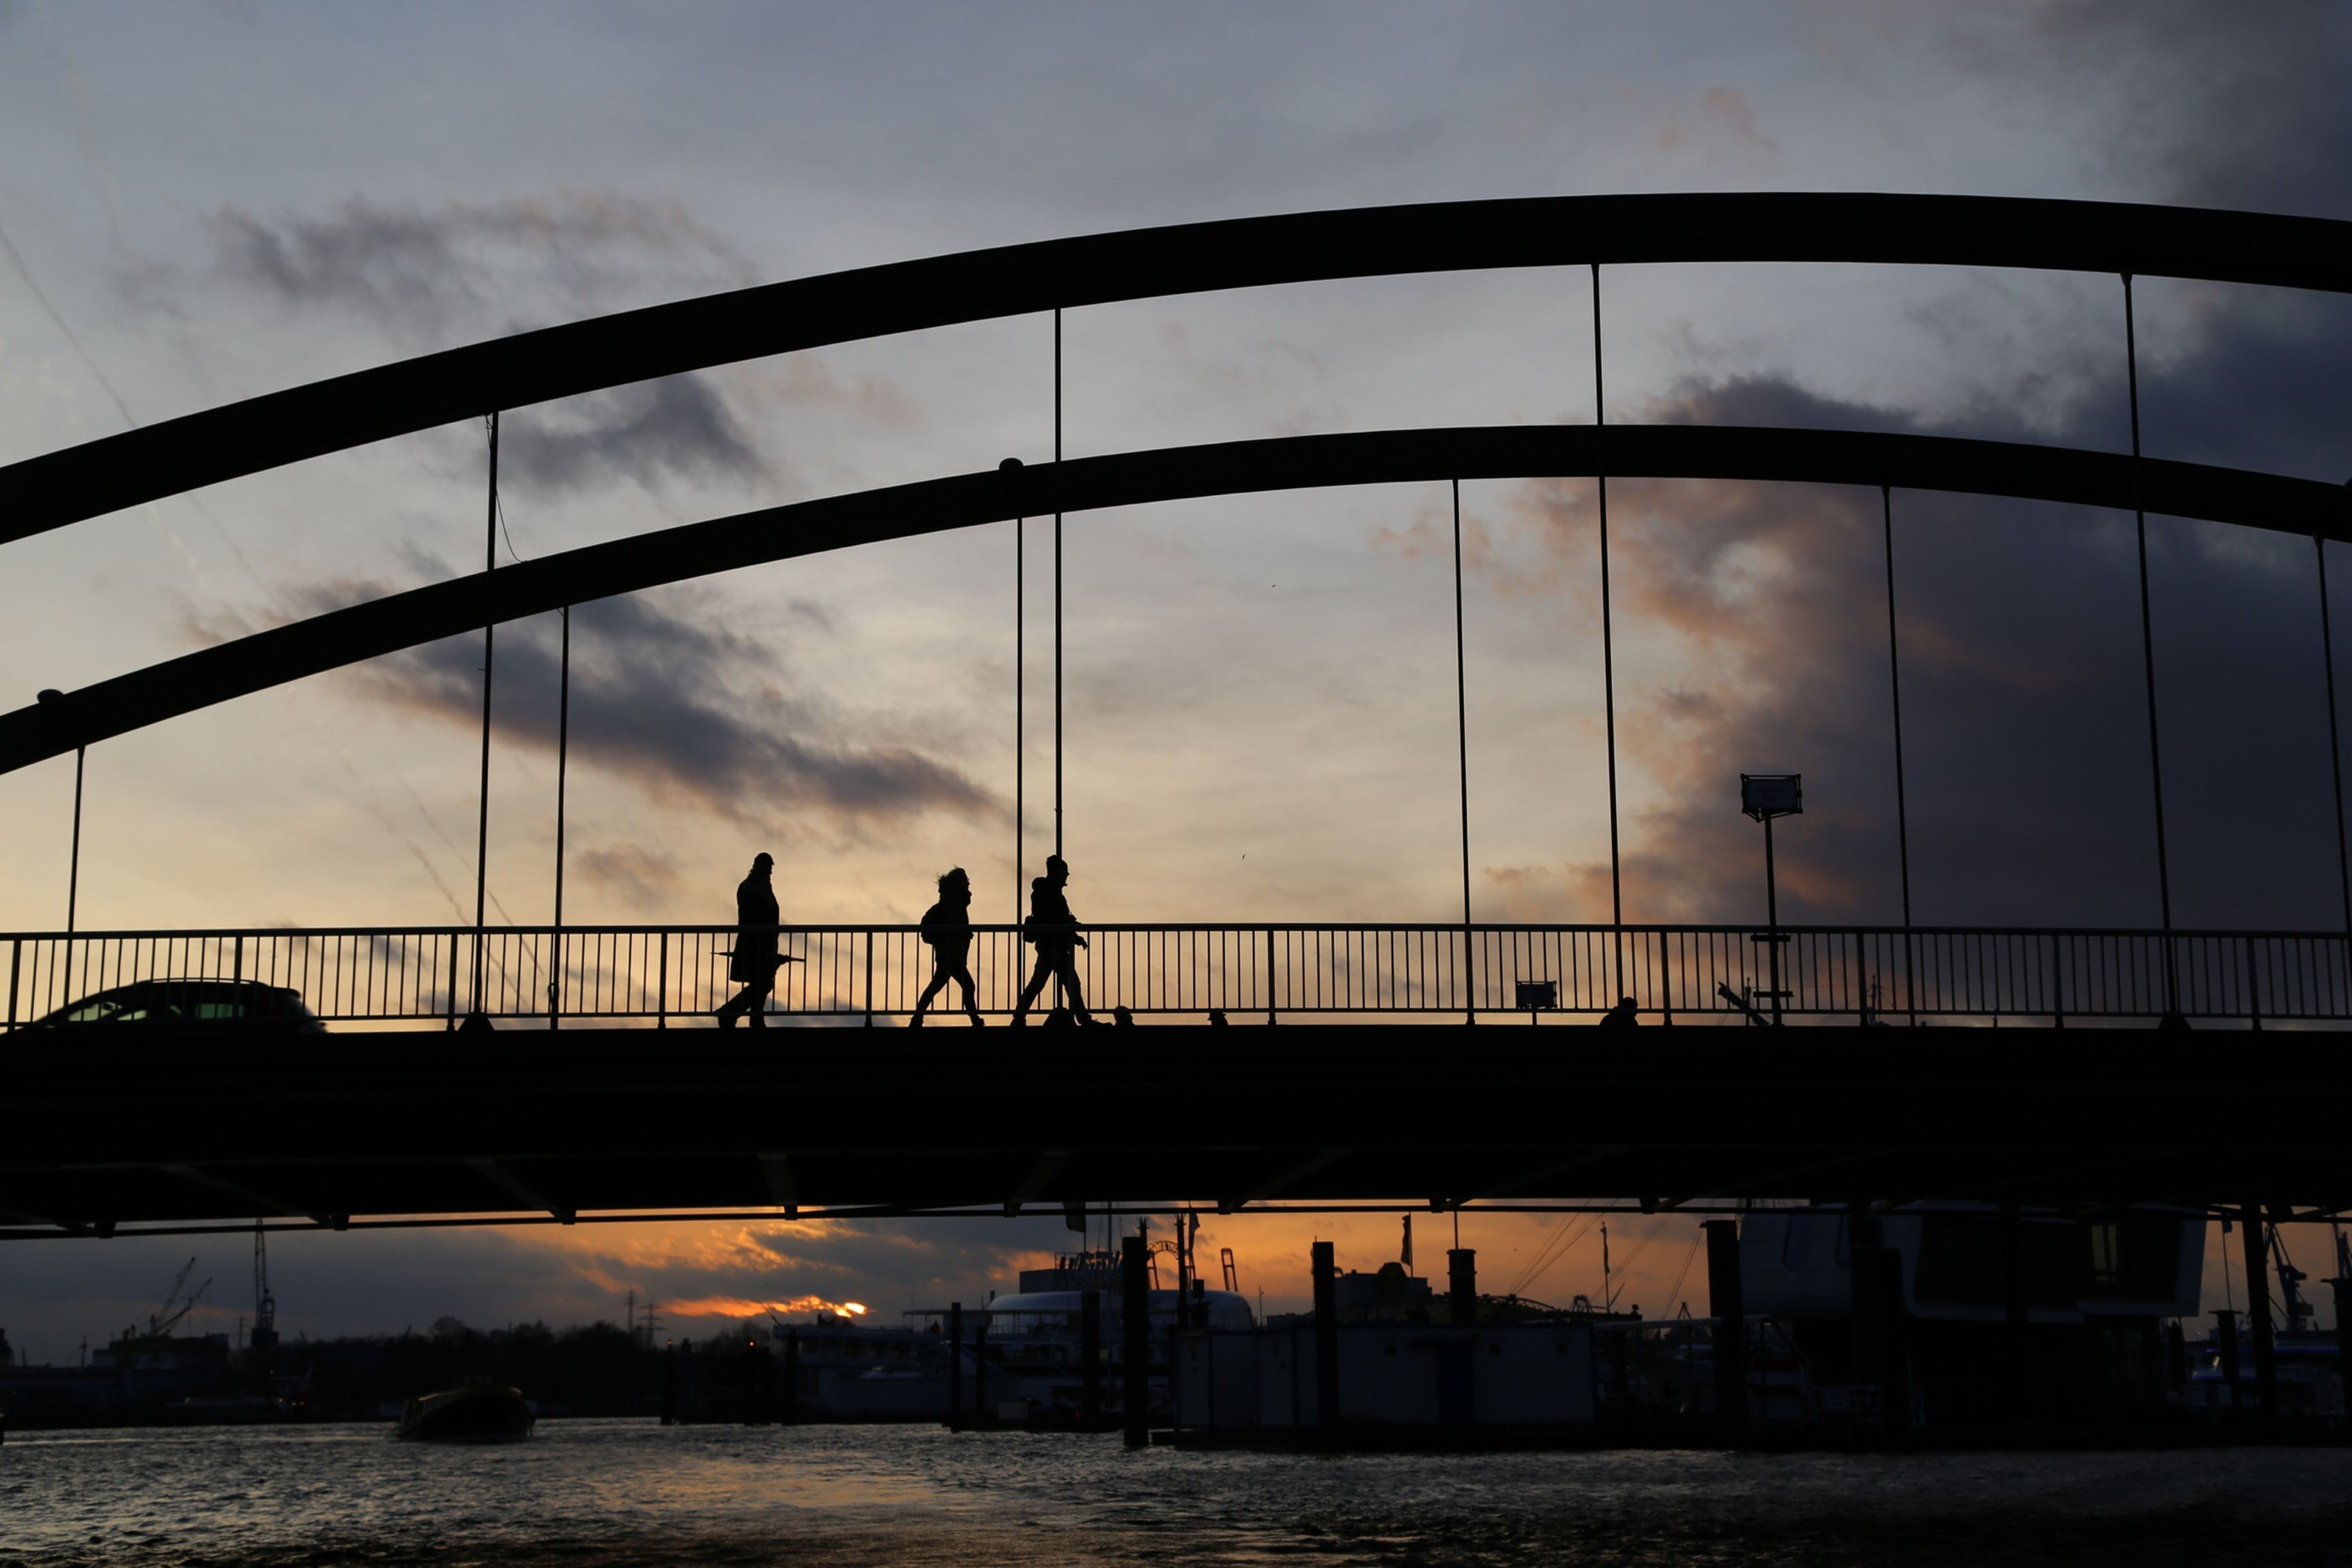 bridge - man made structure, connection, architecture, built structure, silhouette, men, sky, water, railing, lifestyles, walking, bridge, sunset, cloud - sky, transportation, engineering, leisure activity, person